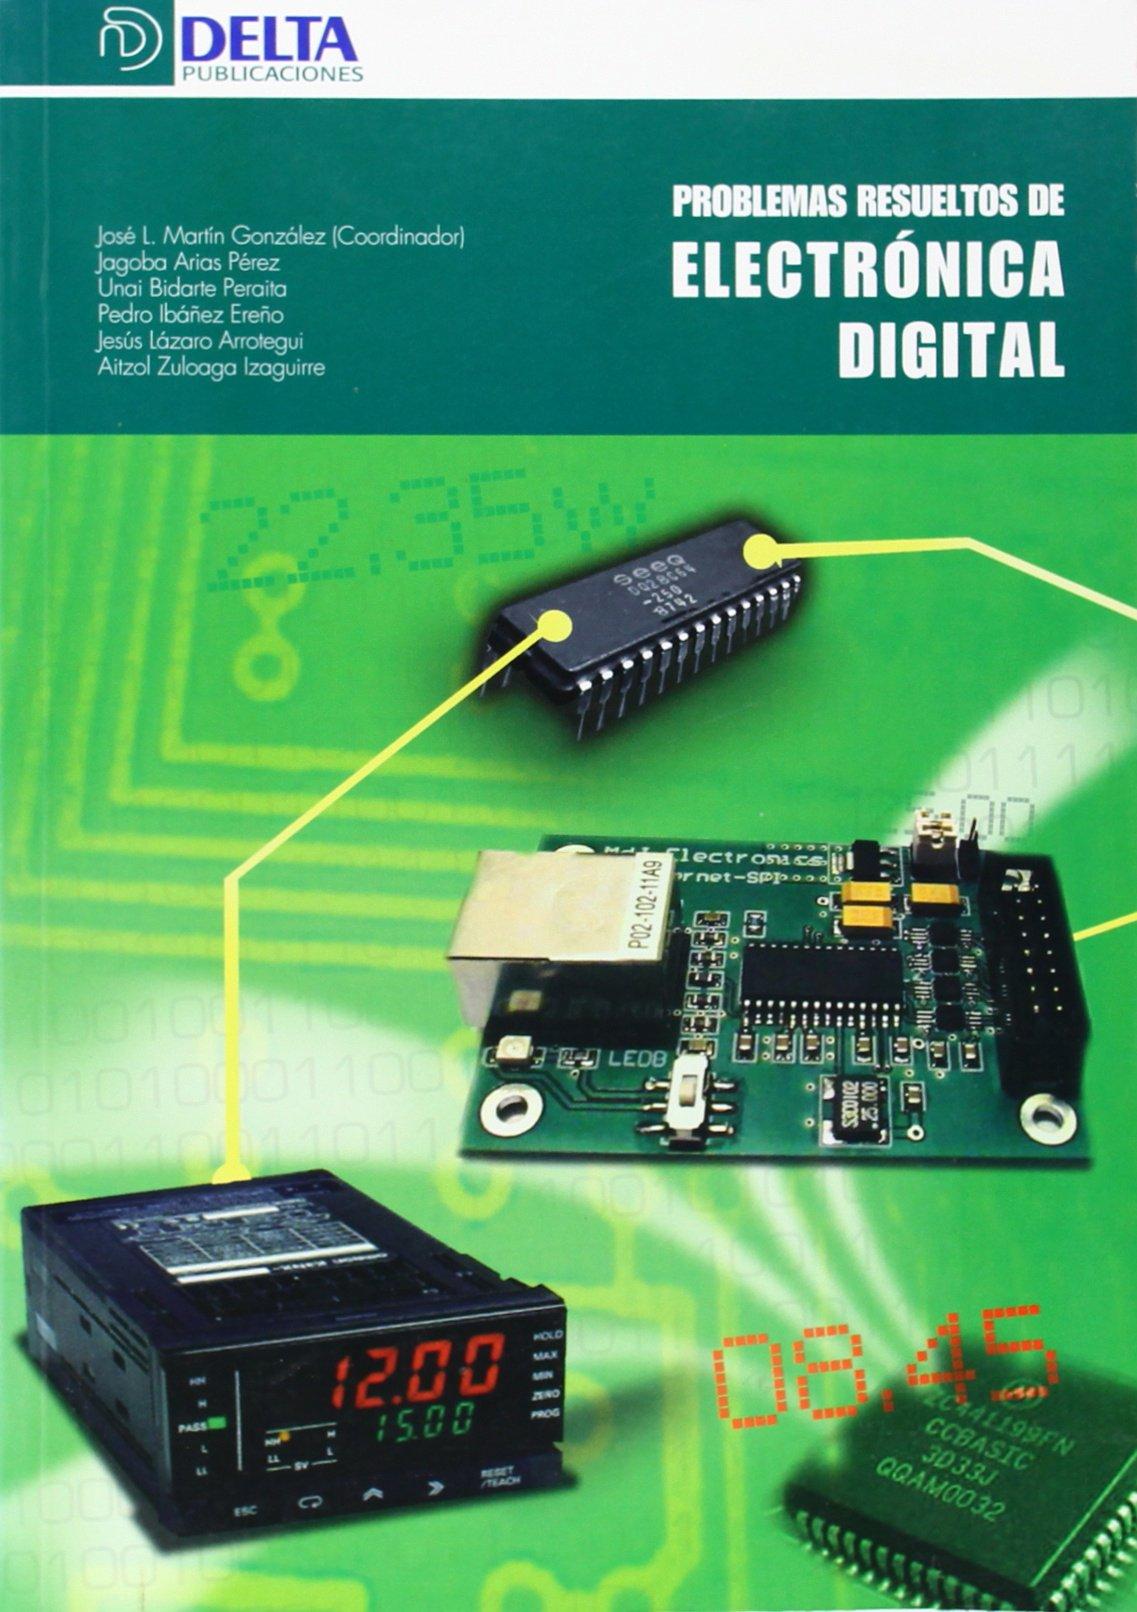 Problemas Resueltos de Electronica Digital: Amazon.es: José Luis Martín  González, Jagoba Arias Pérez, Unai Bidarte Peraita, Pedro Ibáñez Ereño,  Jesús Lázaro ...